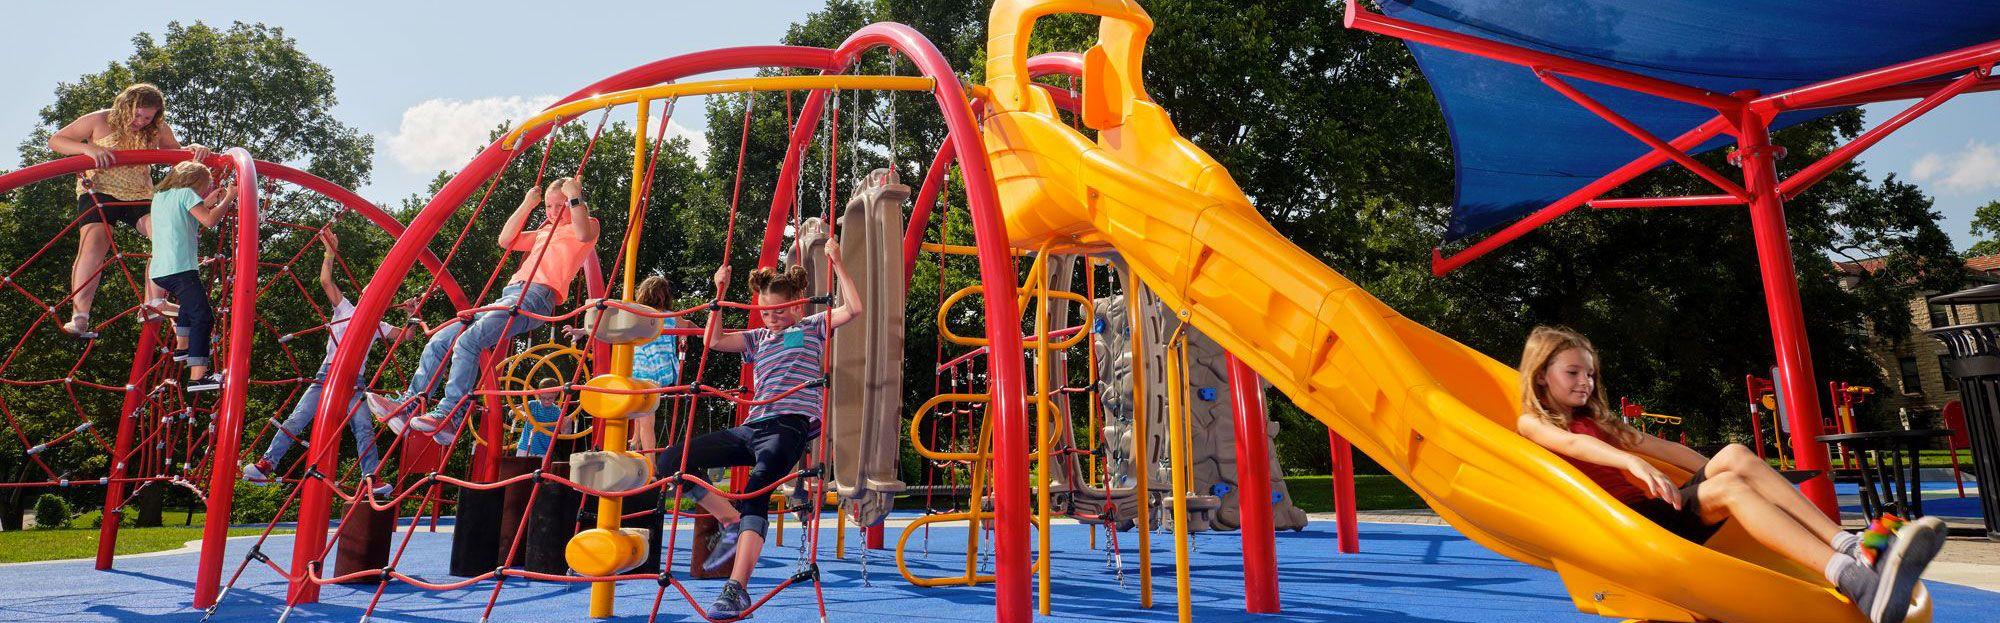 Kids playing on playground Janet Majeras Park